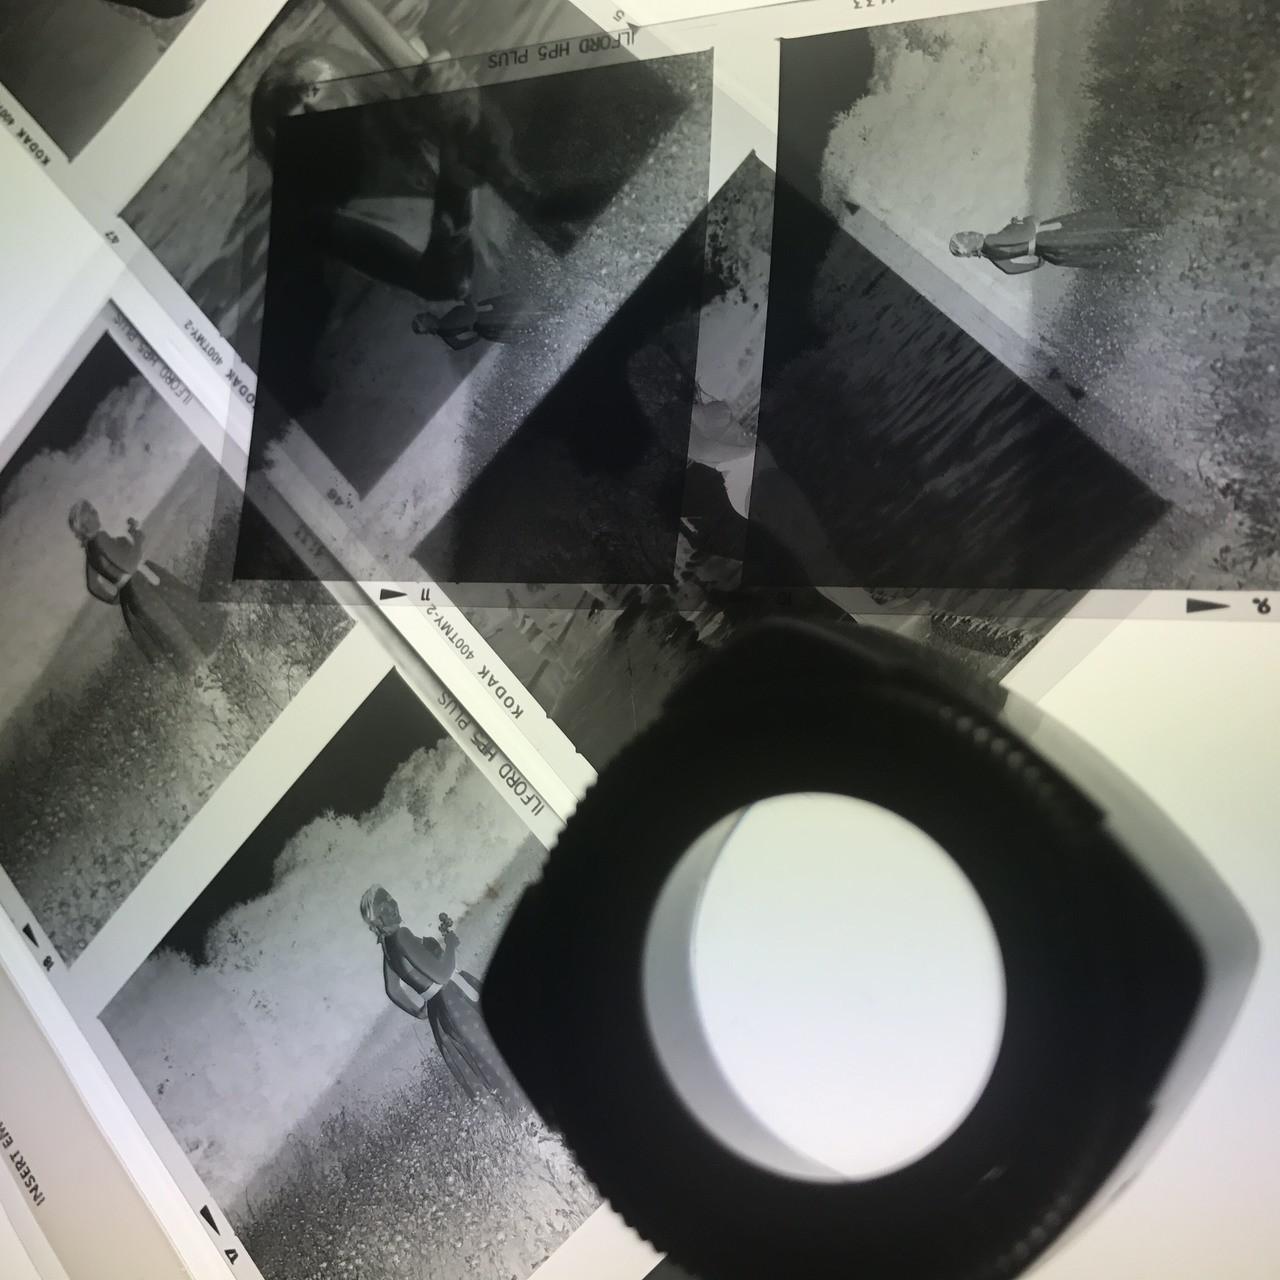 Developing film in the darkroom